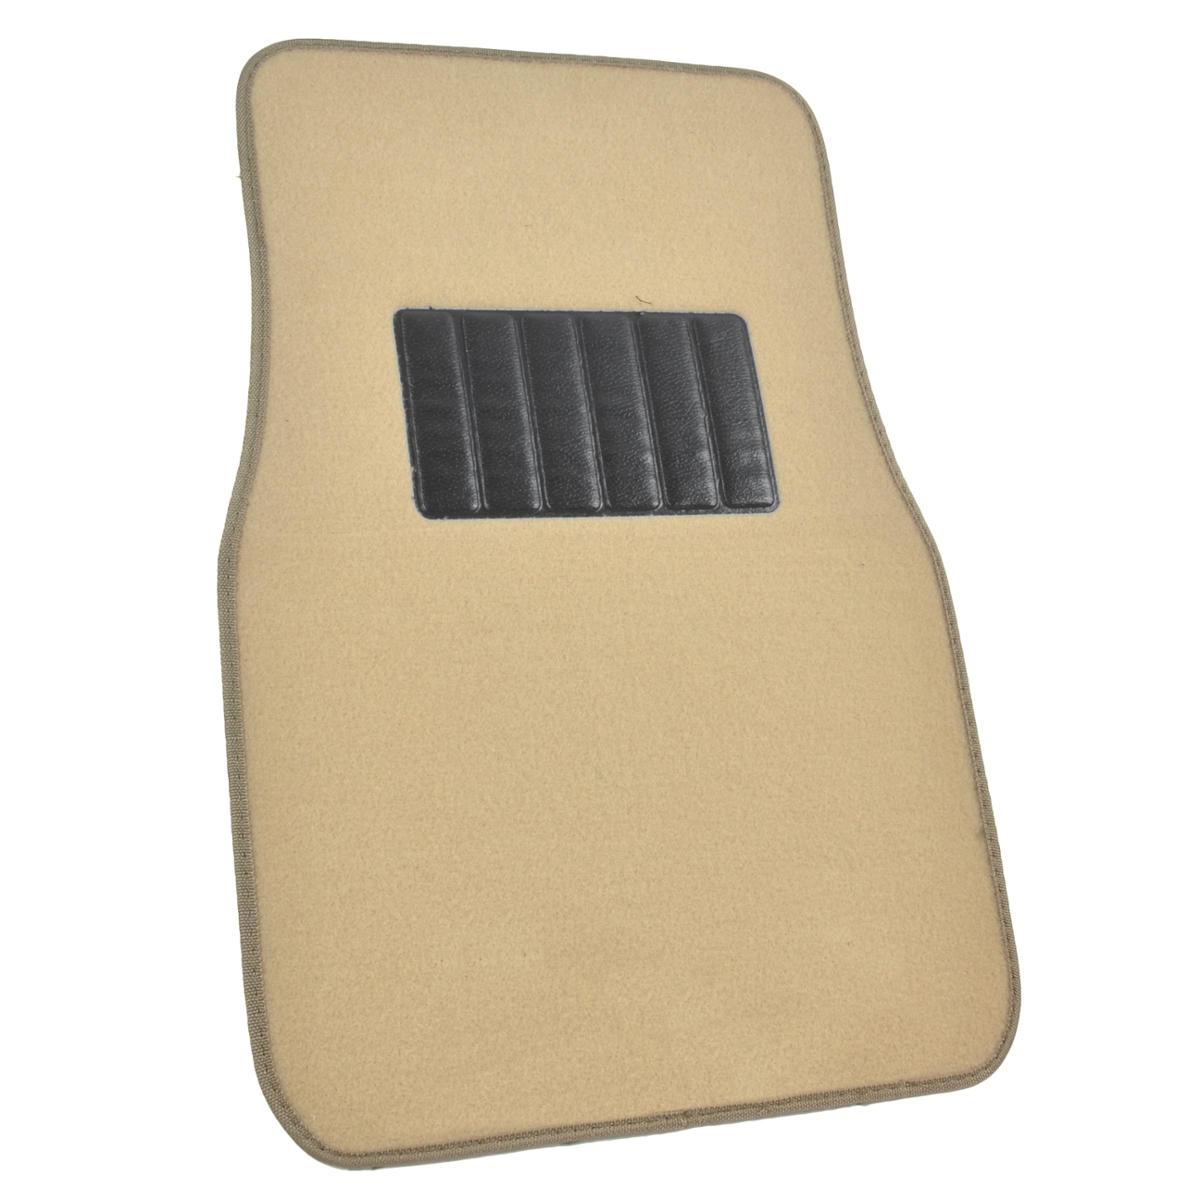 Light Beige Tan Cream Car Floor Mats Liner Pads Utility